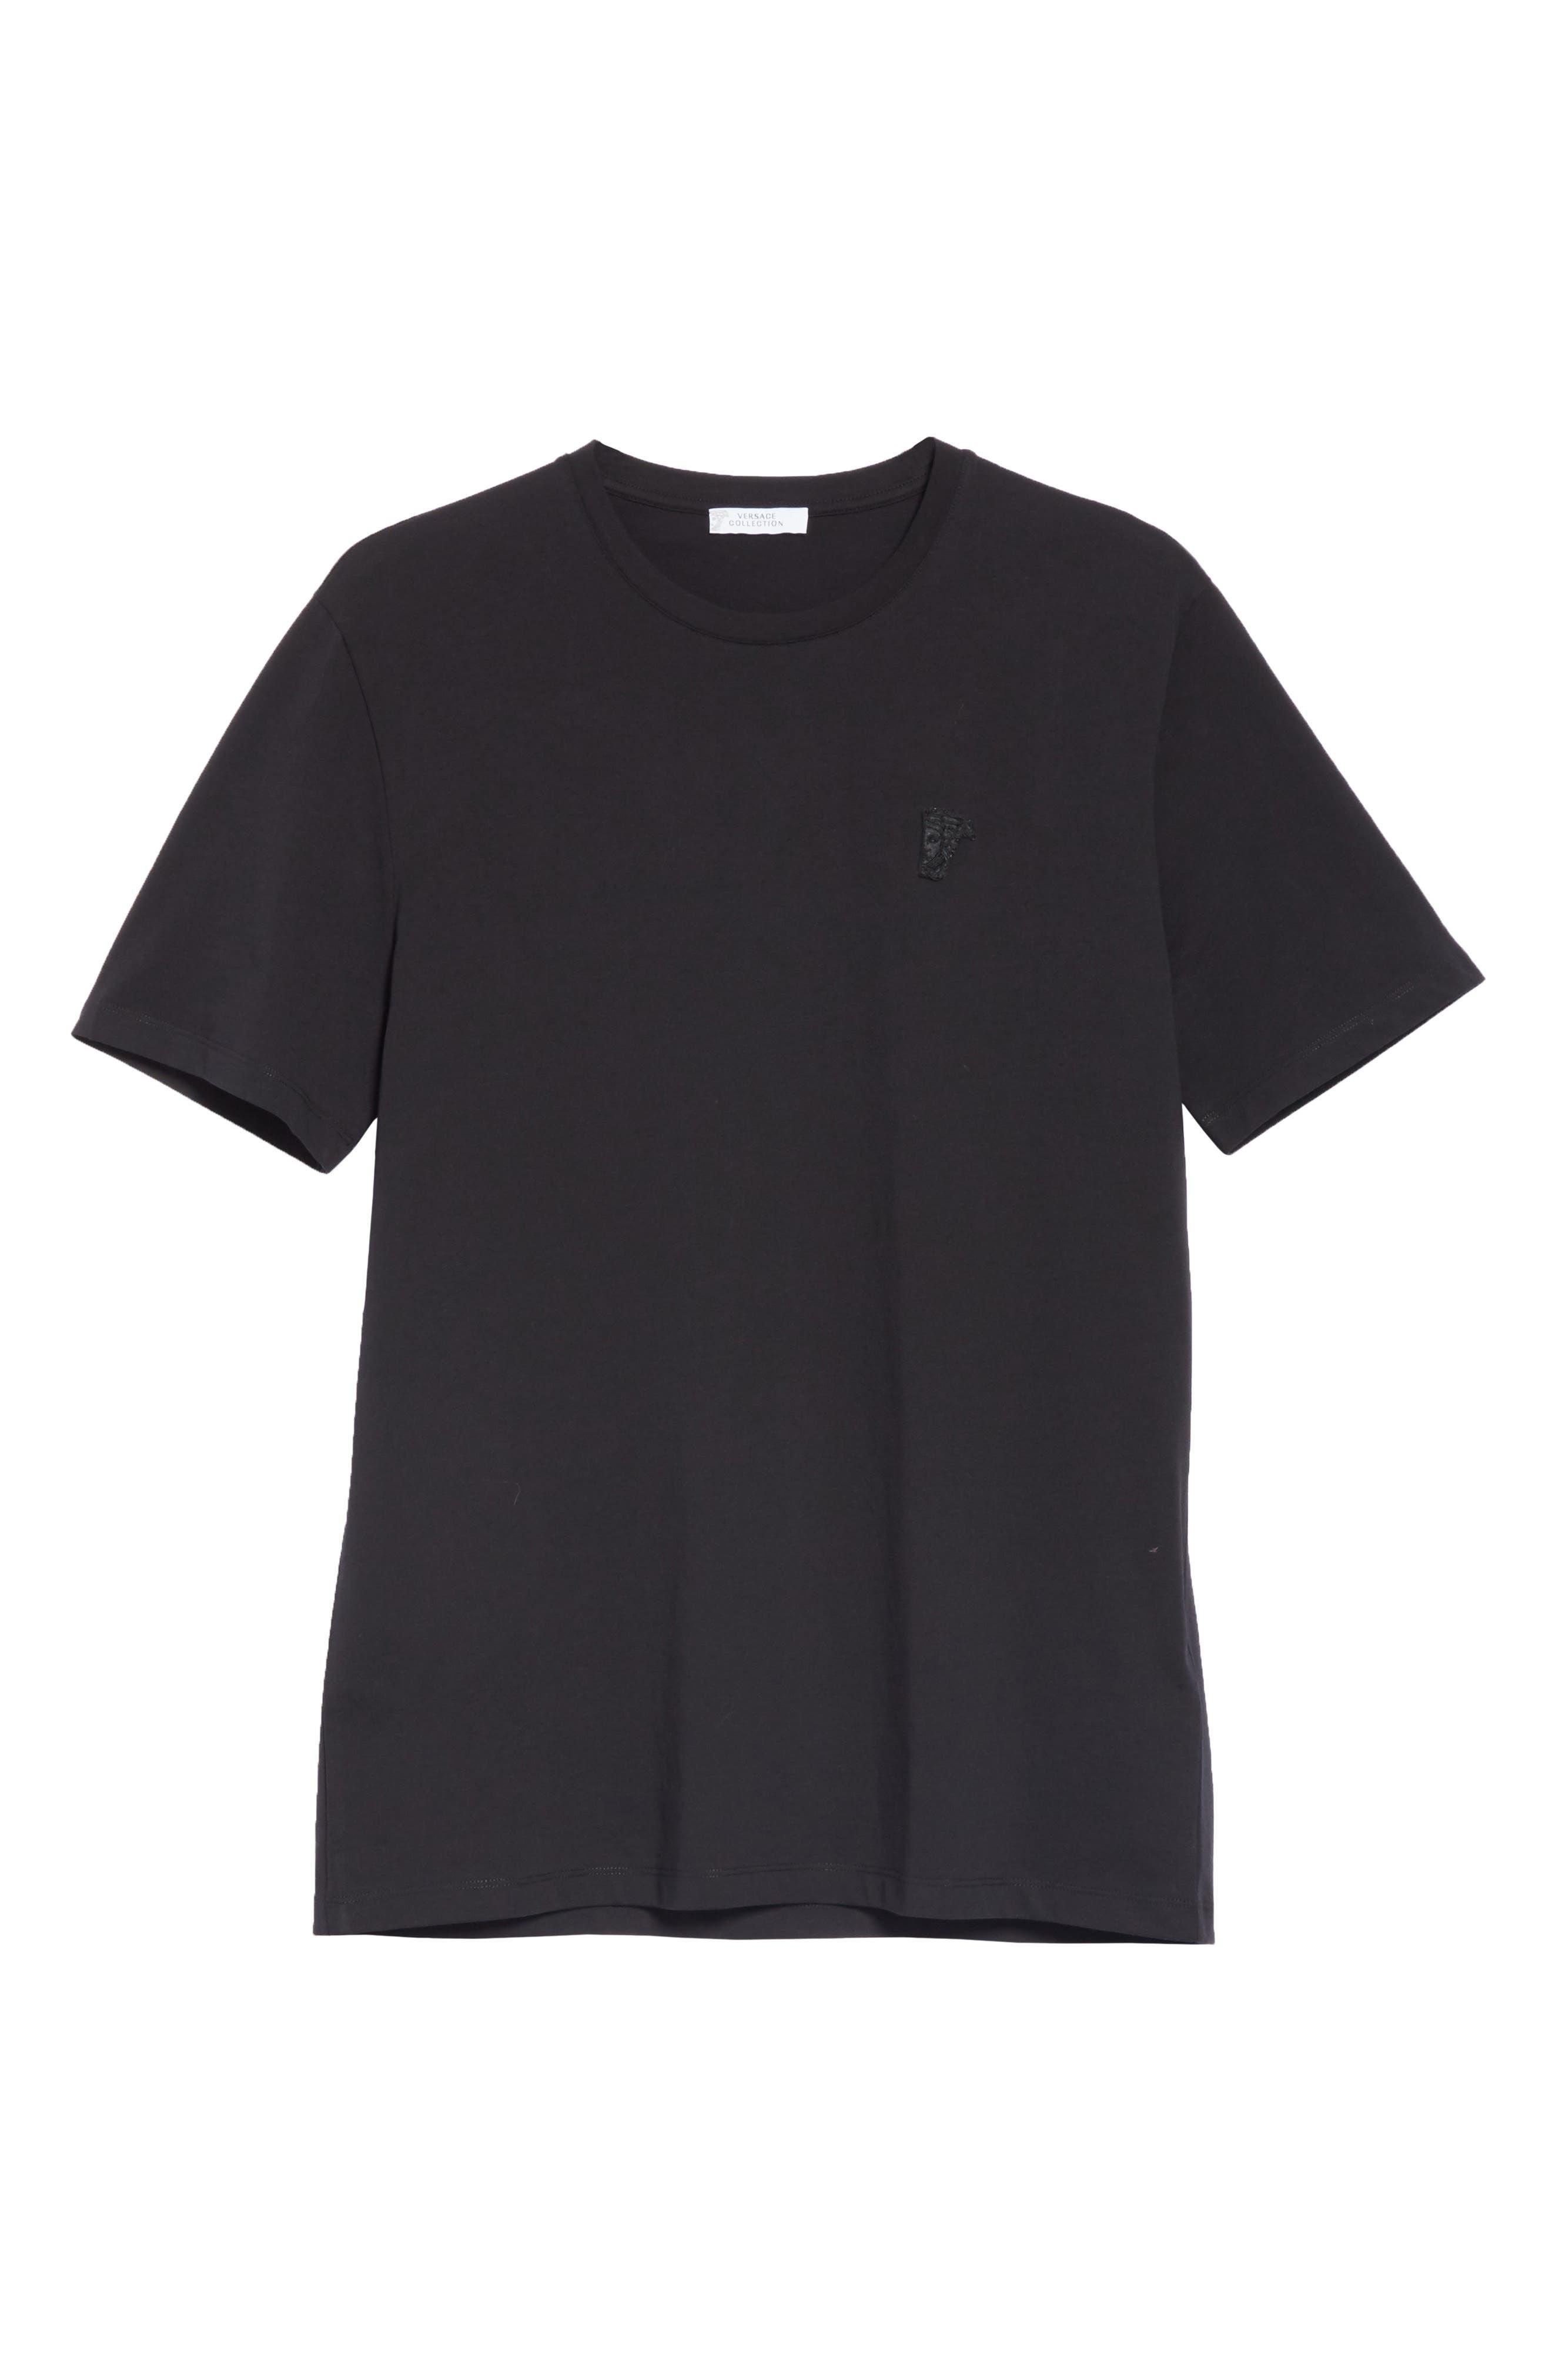 VERSACE COLLECTION,                             Half Medusa T-Shirt,                             Alternate thumbnail 6, color,                             BLACK